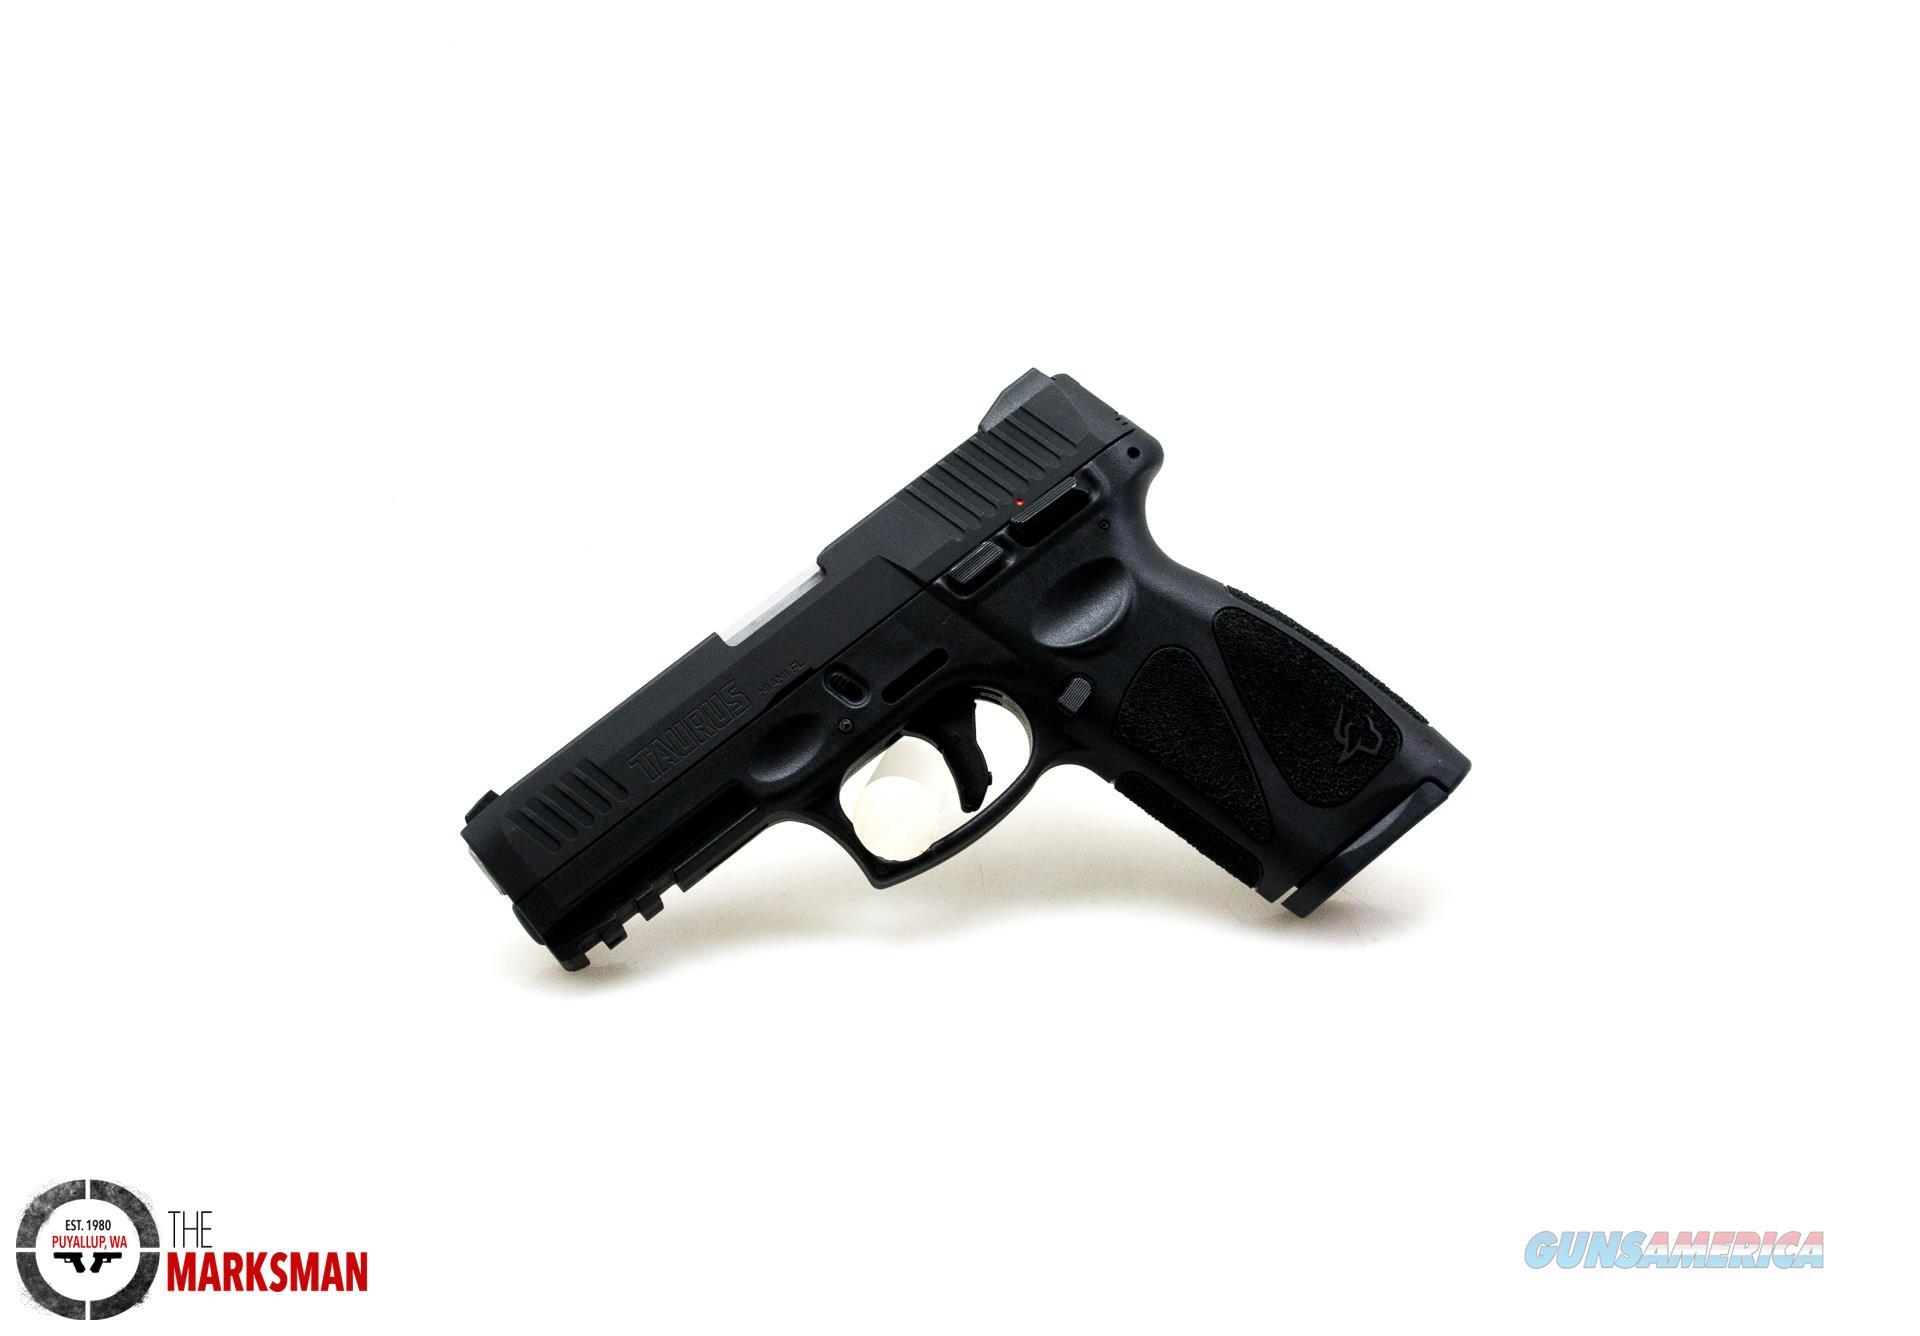 Taurus G3, 9mm NEW  Guns > Pistols > Taurus Pistols > Semi Auto Pistols > Polymer Frame